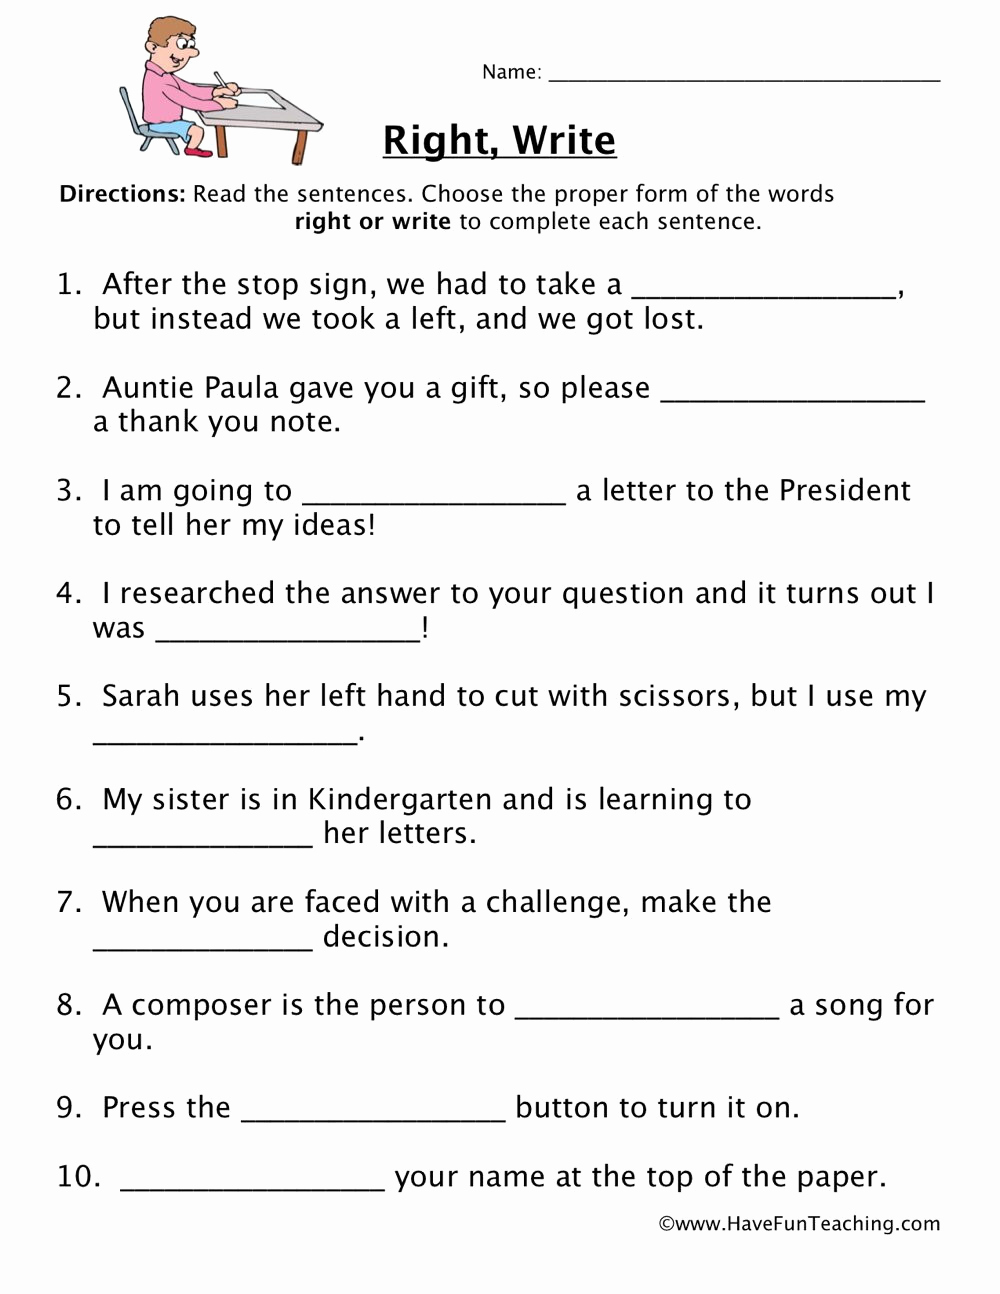 Homonyms Worksheets 5th Grade Inspirational Homophones Worksheet 5th Grade